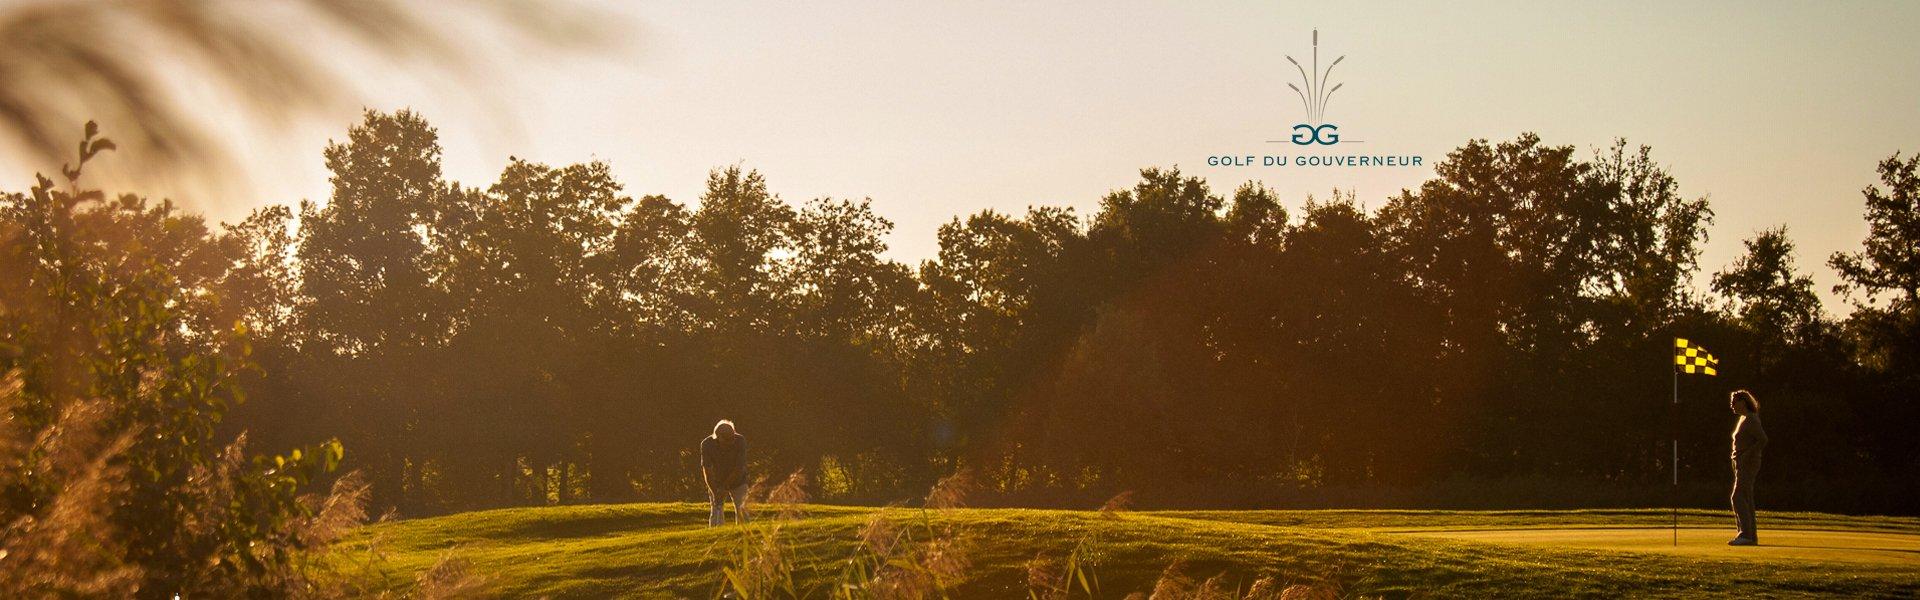 golf-gouverneur.jpg